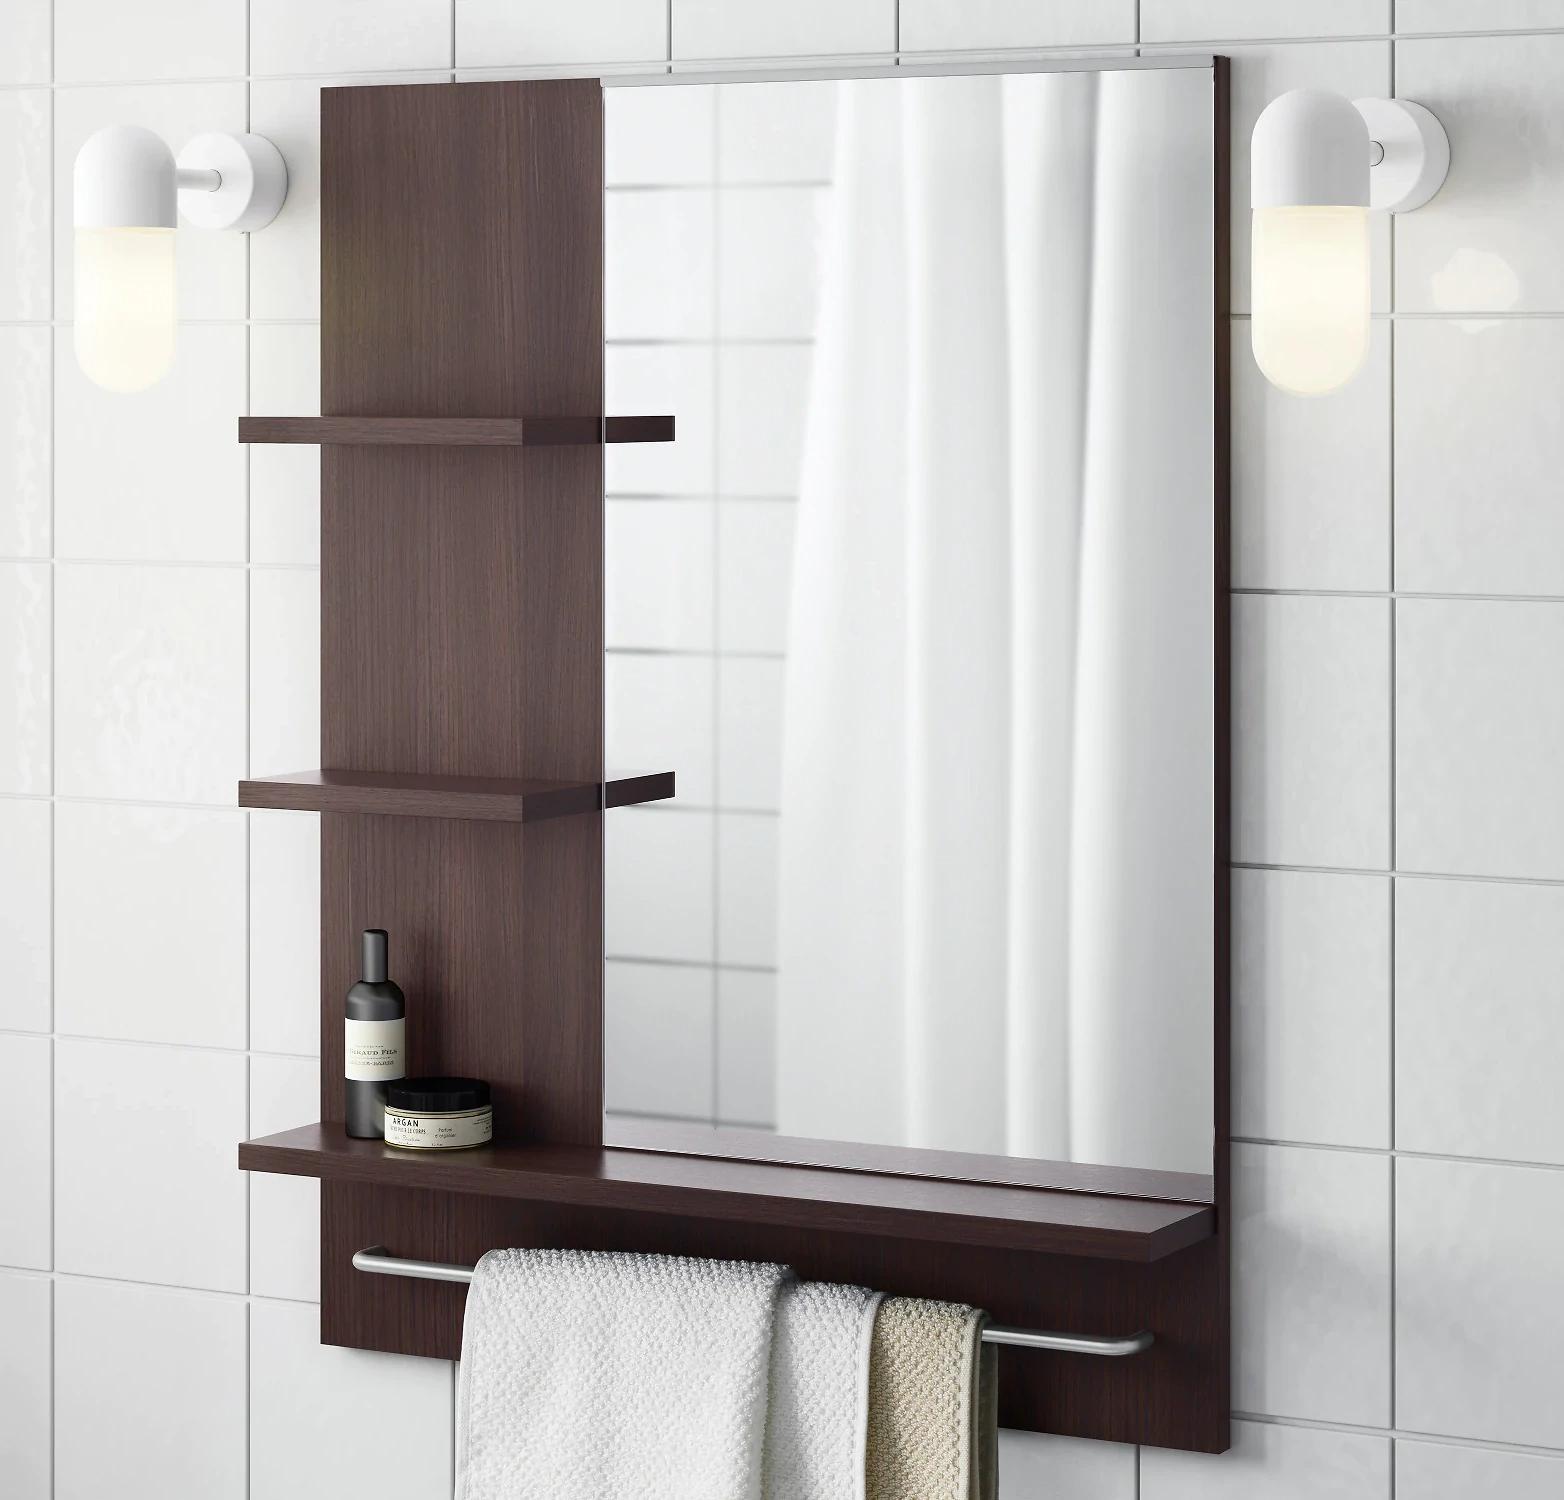 LILLÅNGEN Mirror & Shelves, black-brown for £15 instore @ IKEA